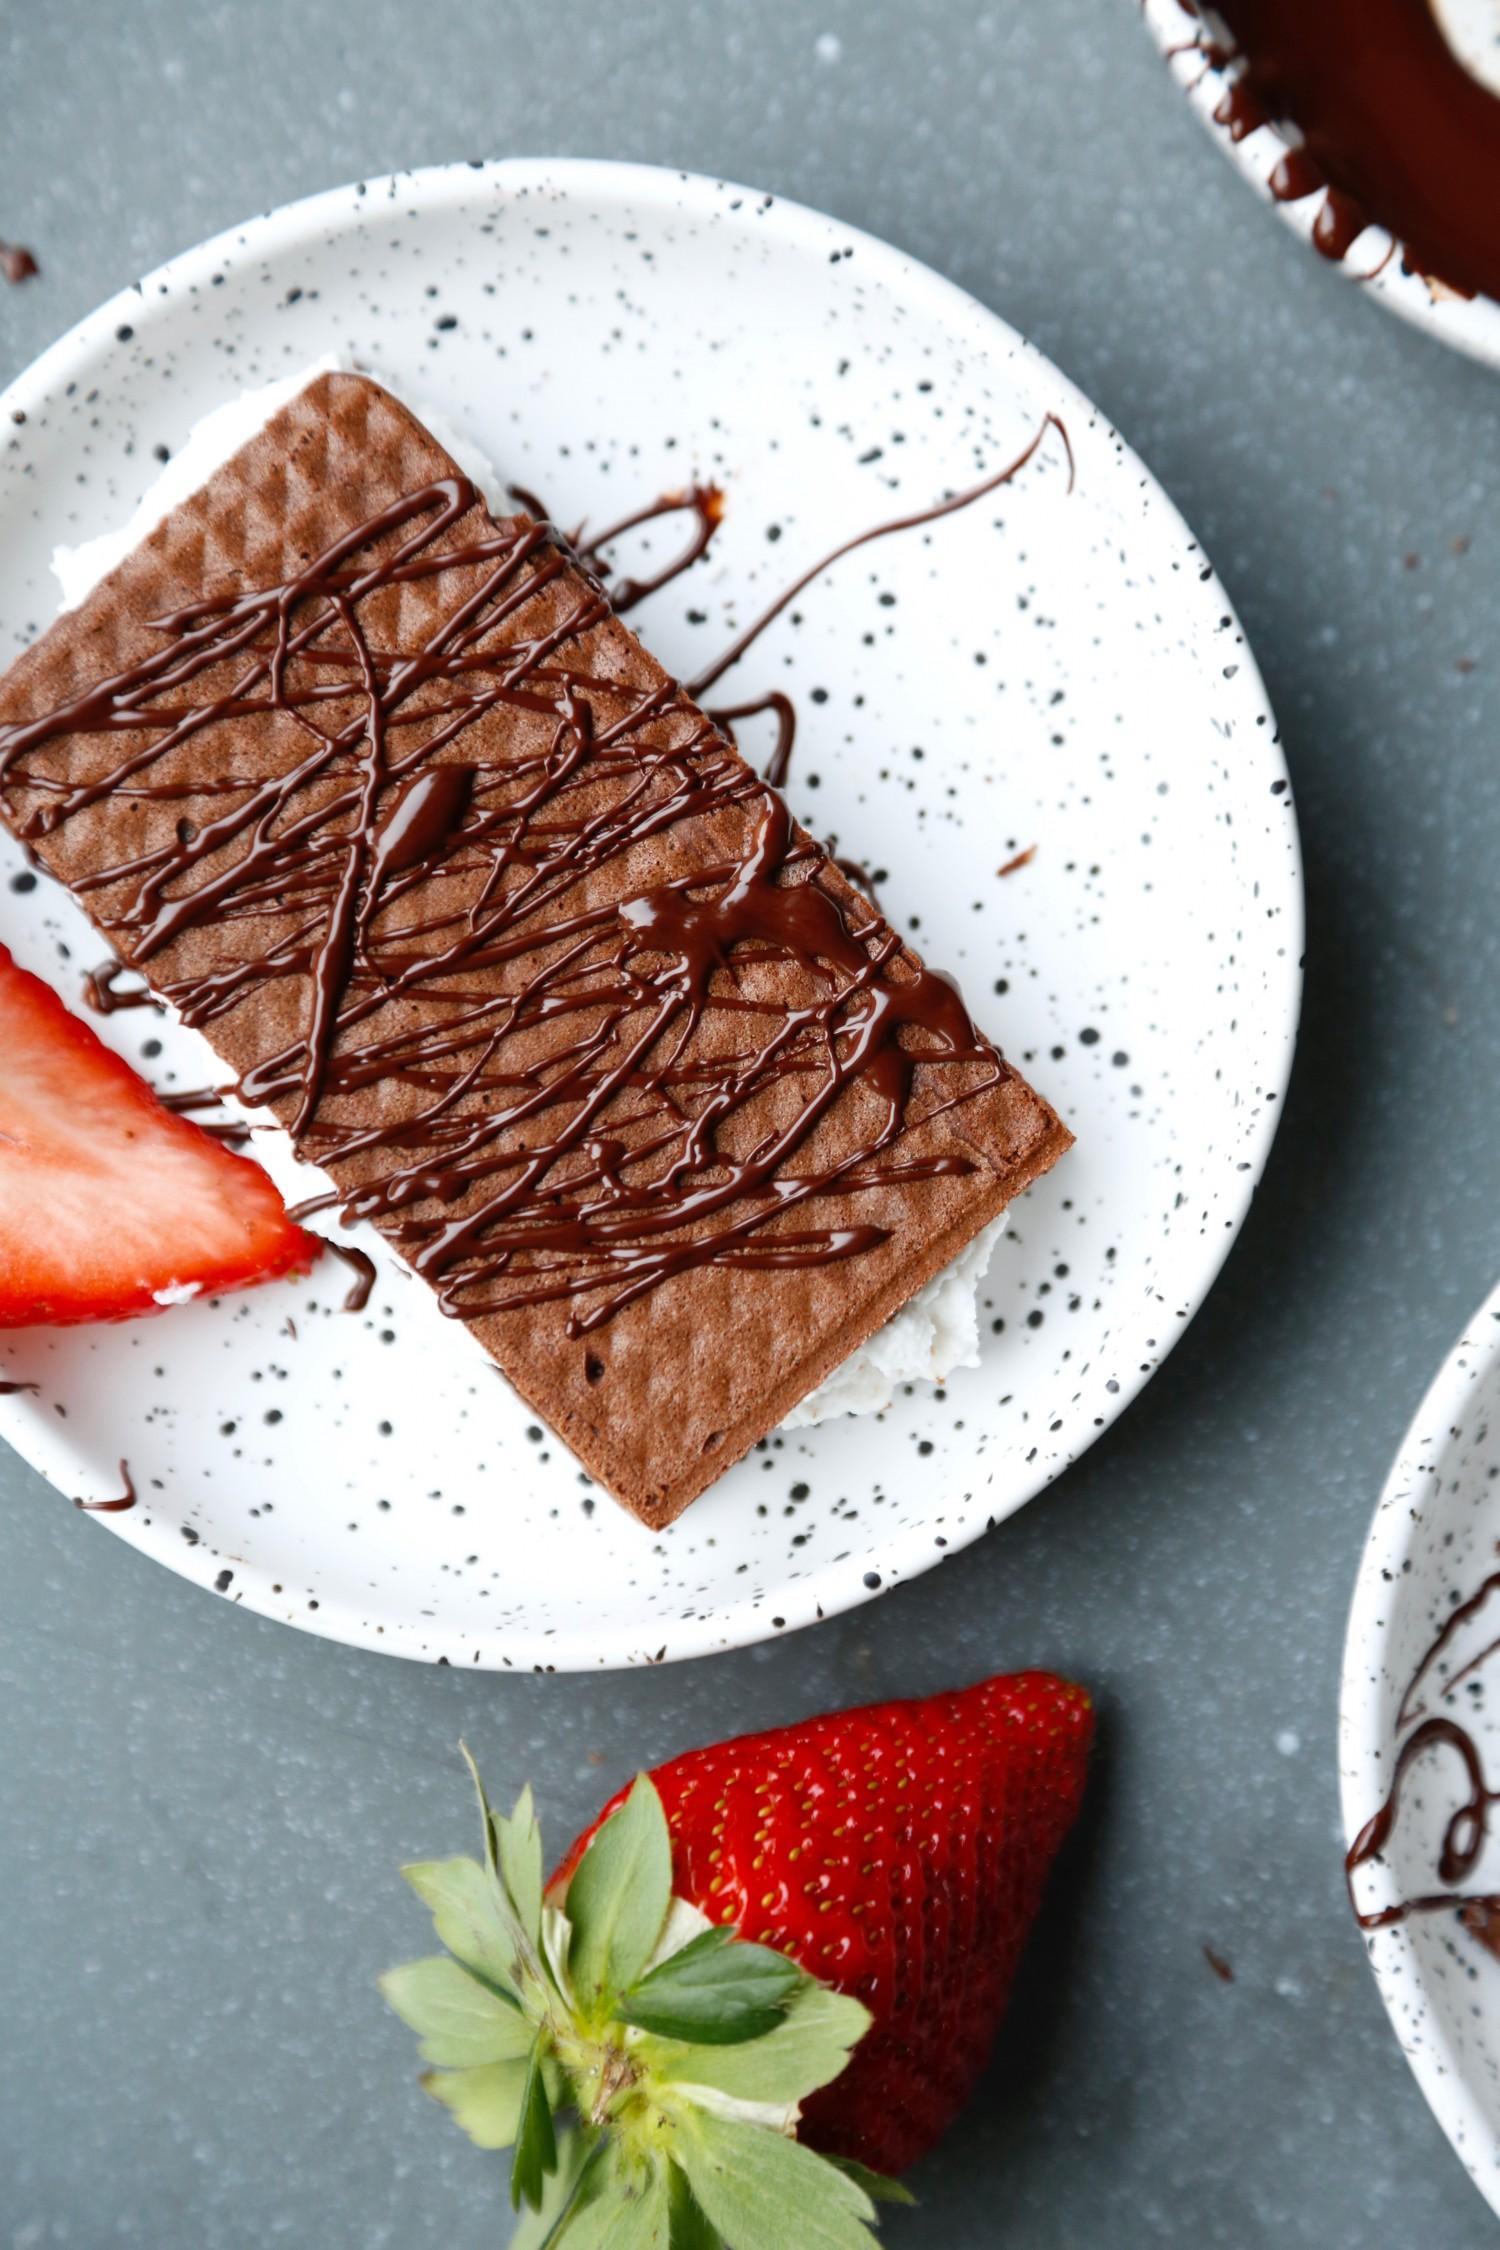 vaffelsandwich-chokoladevafler-med-kokosskum-ala-maelkesnitte-1-1